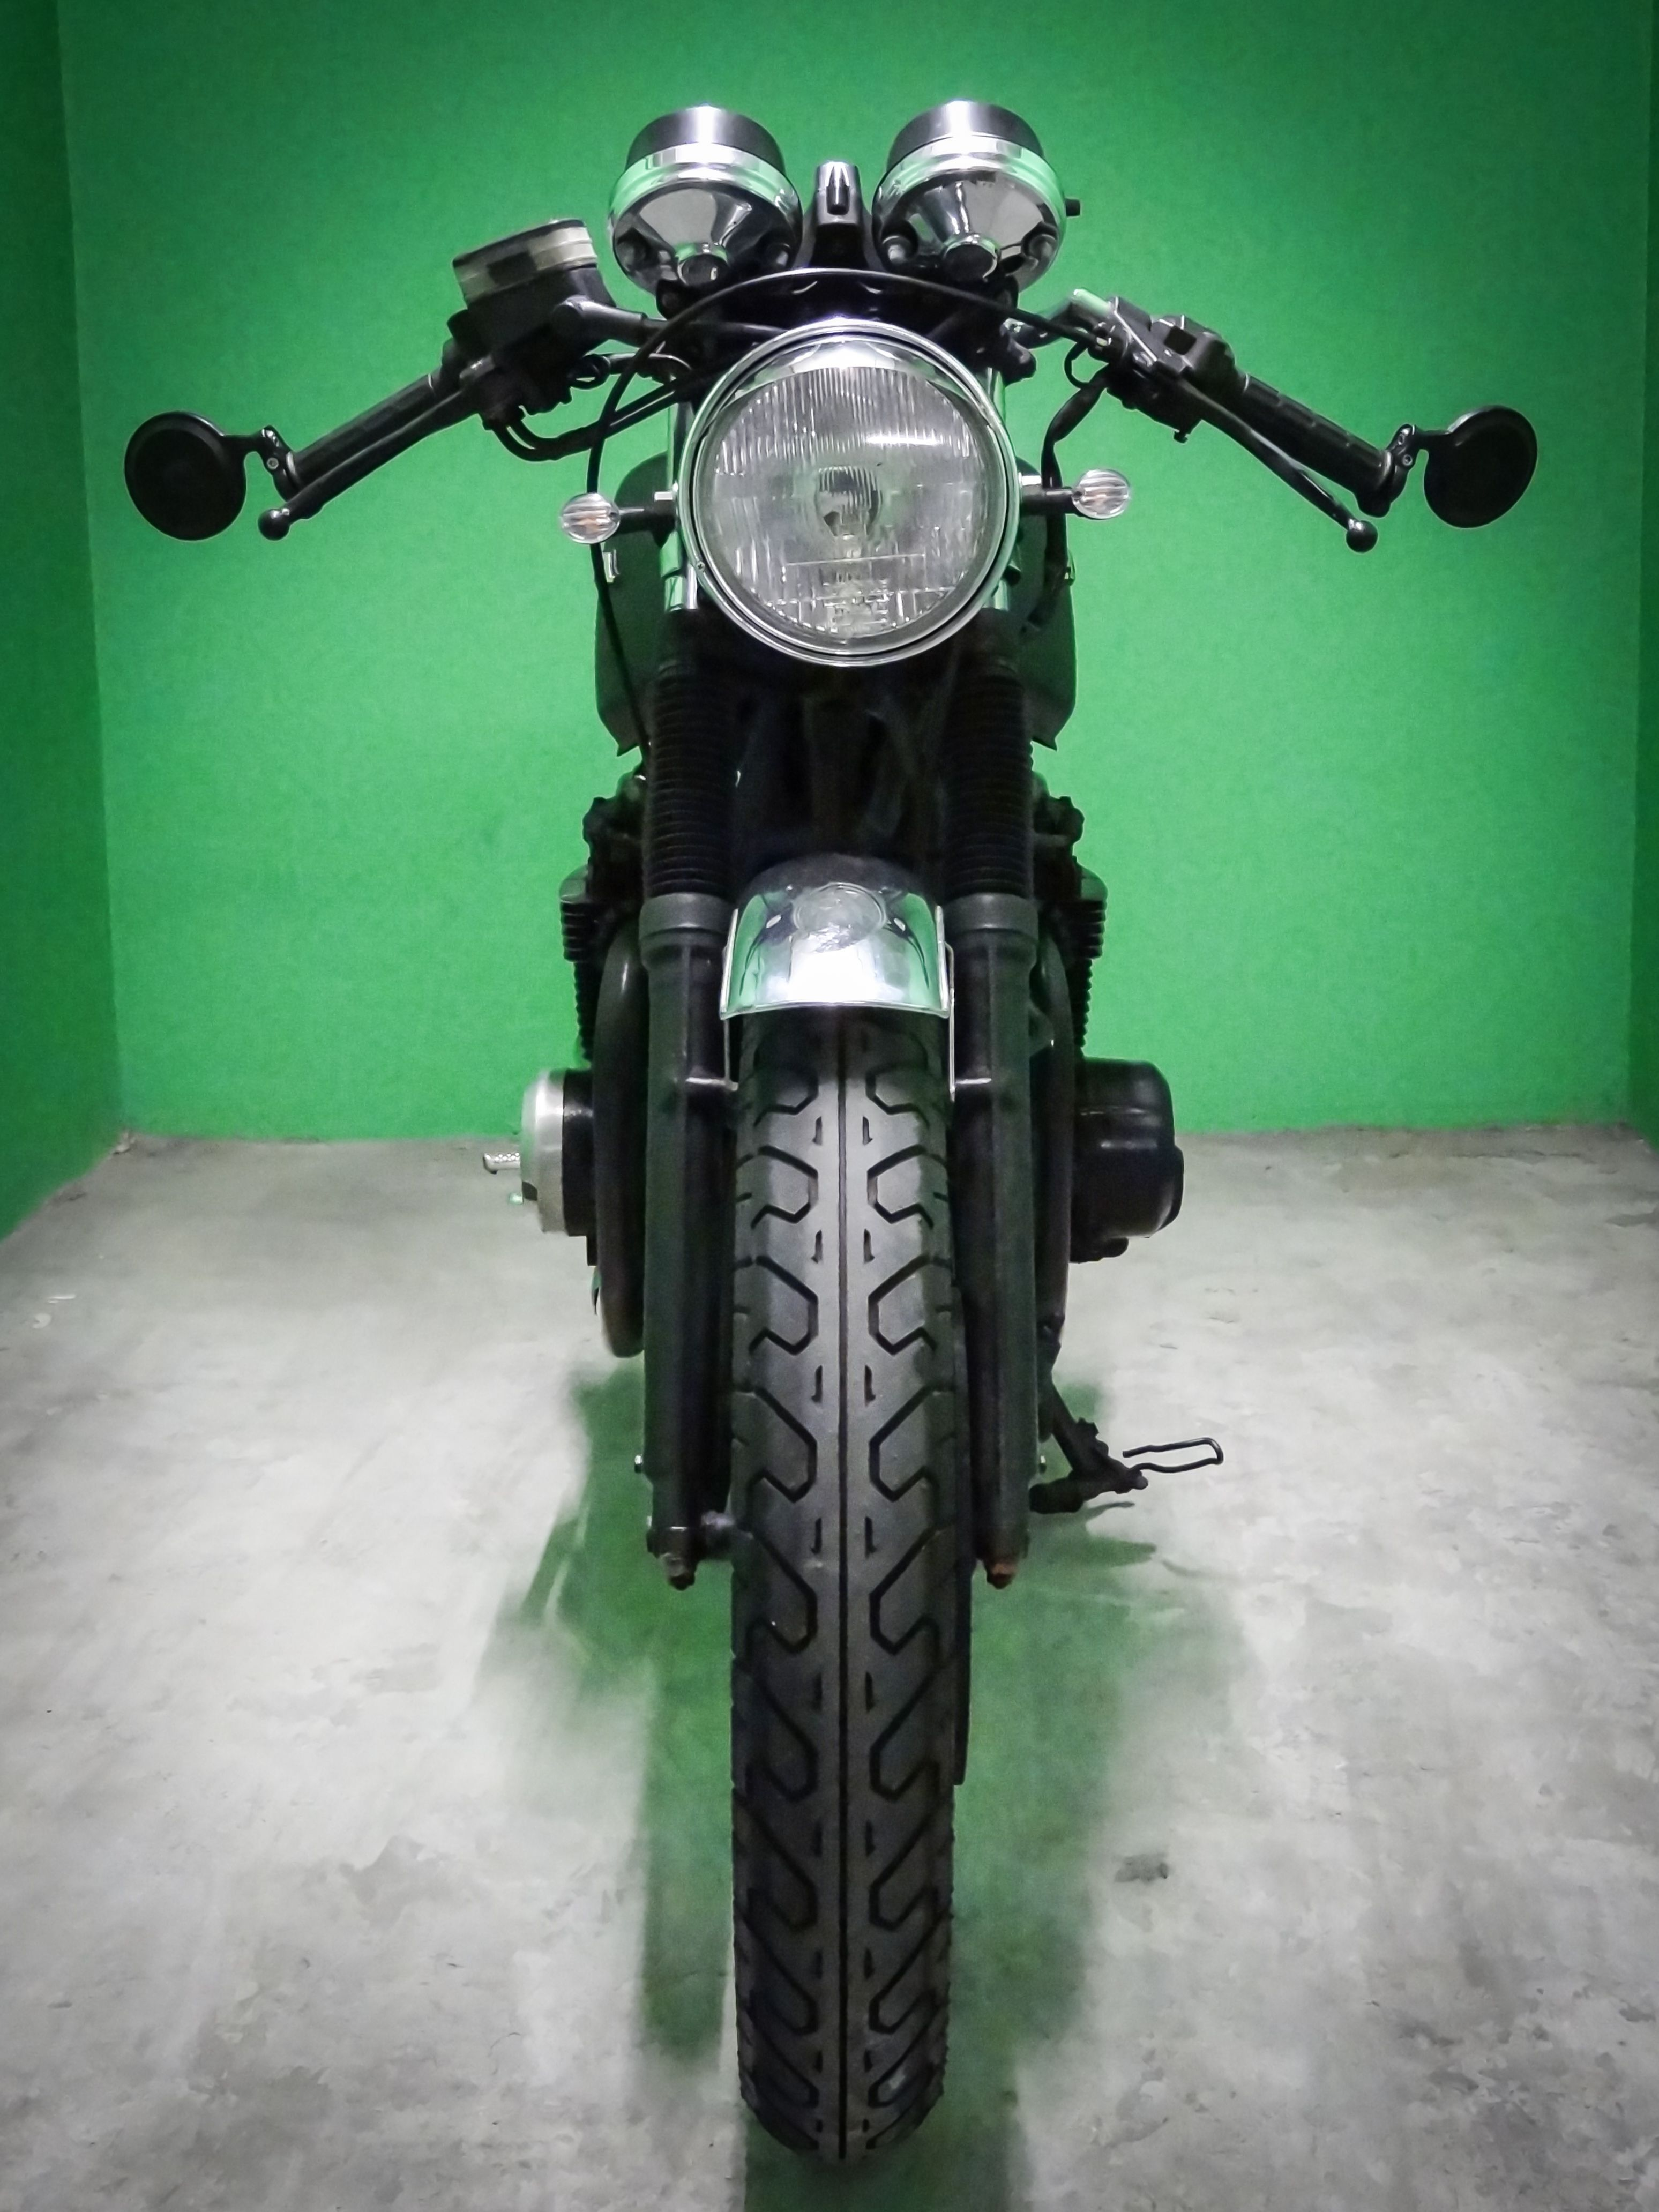 honda cb motorcycle my cb cafe racer build honda cb650 motorcycle